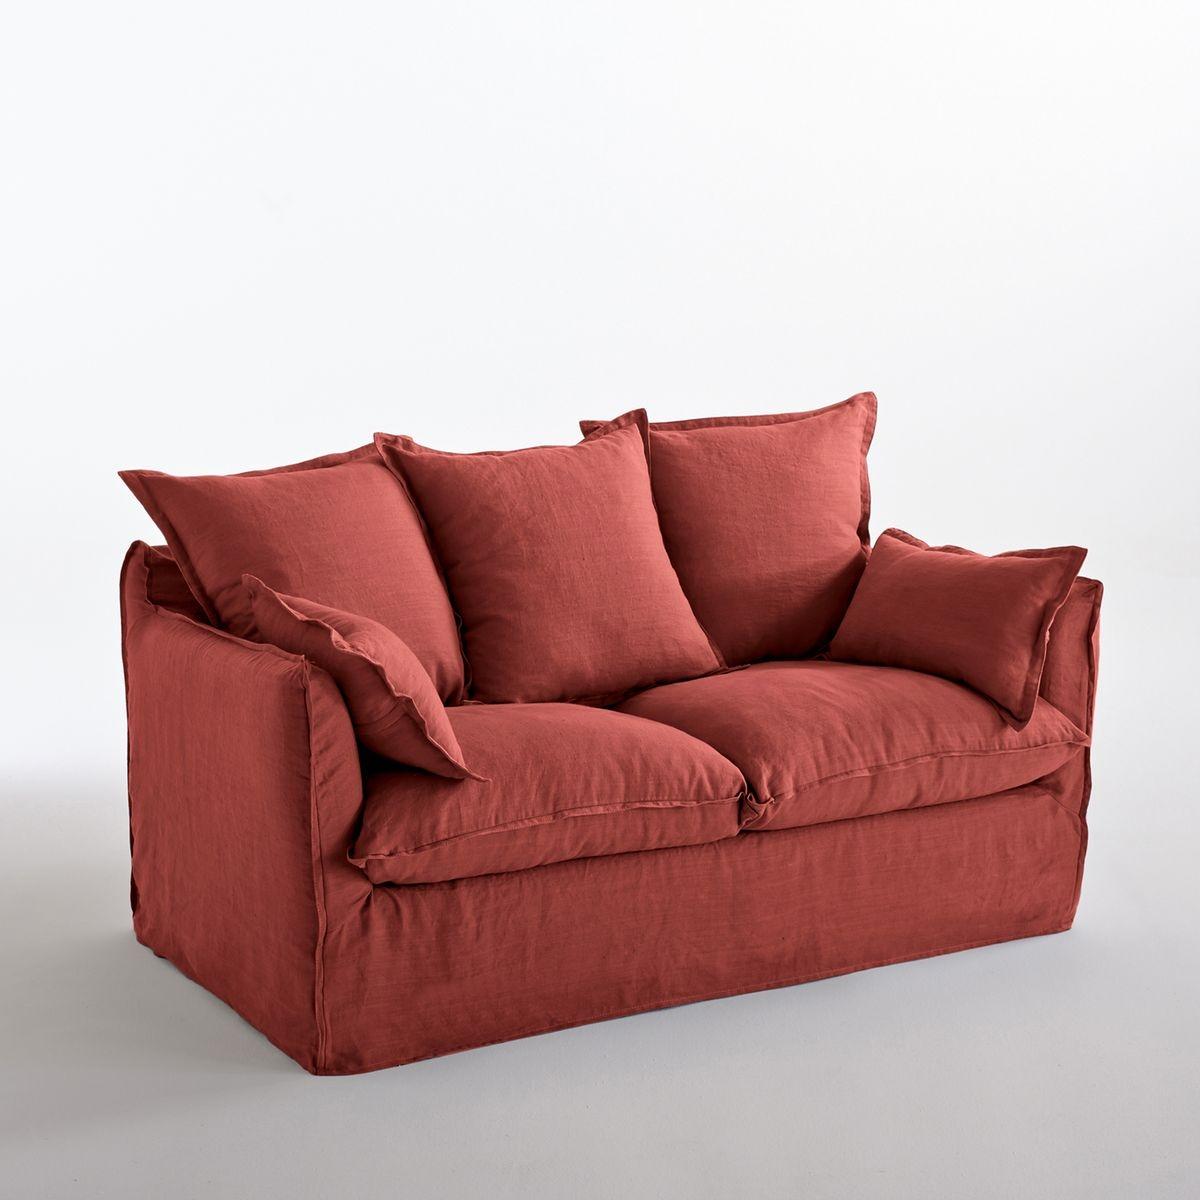 vente escaliers de piscines tritoo maison et jardin. Black Bedroom Furniture Sets. Home Design Ideas